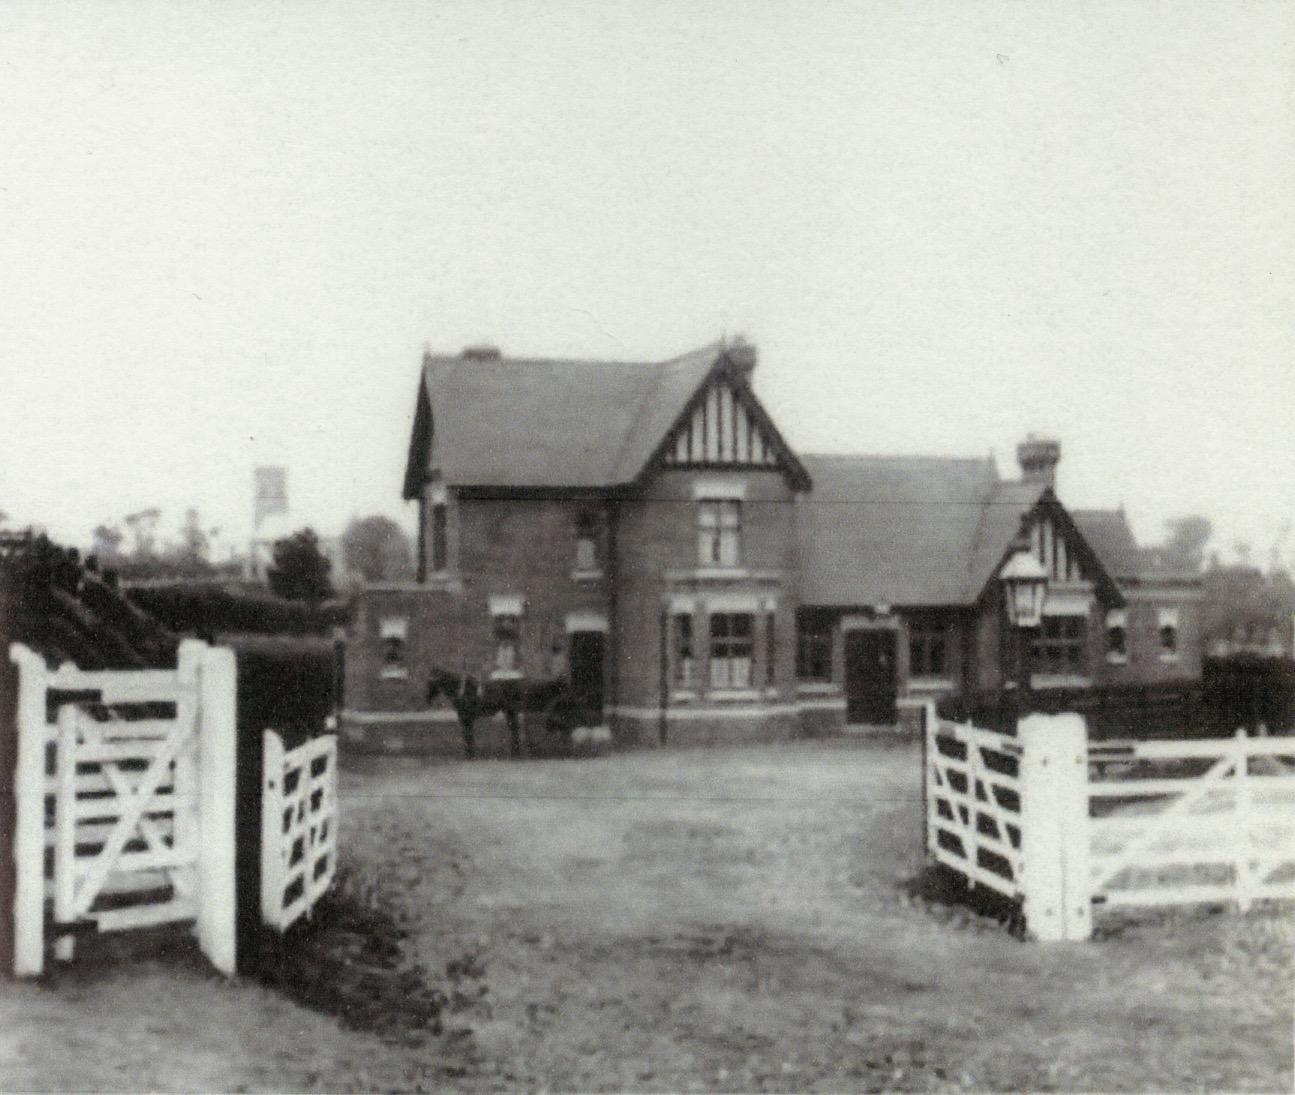 Knapton Station when new